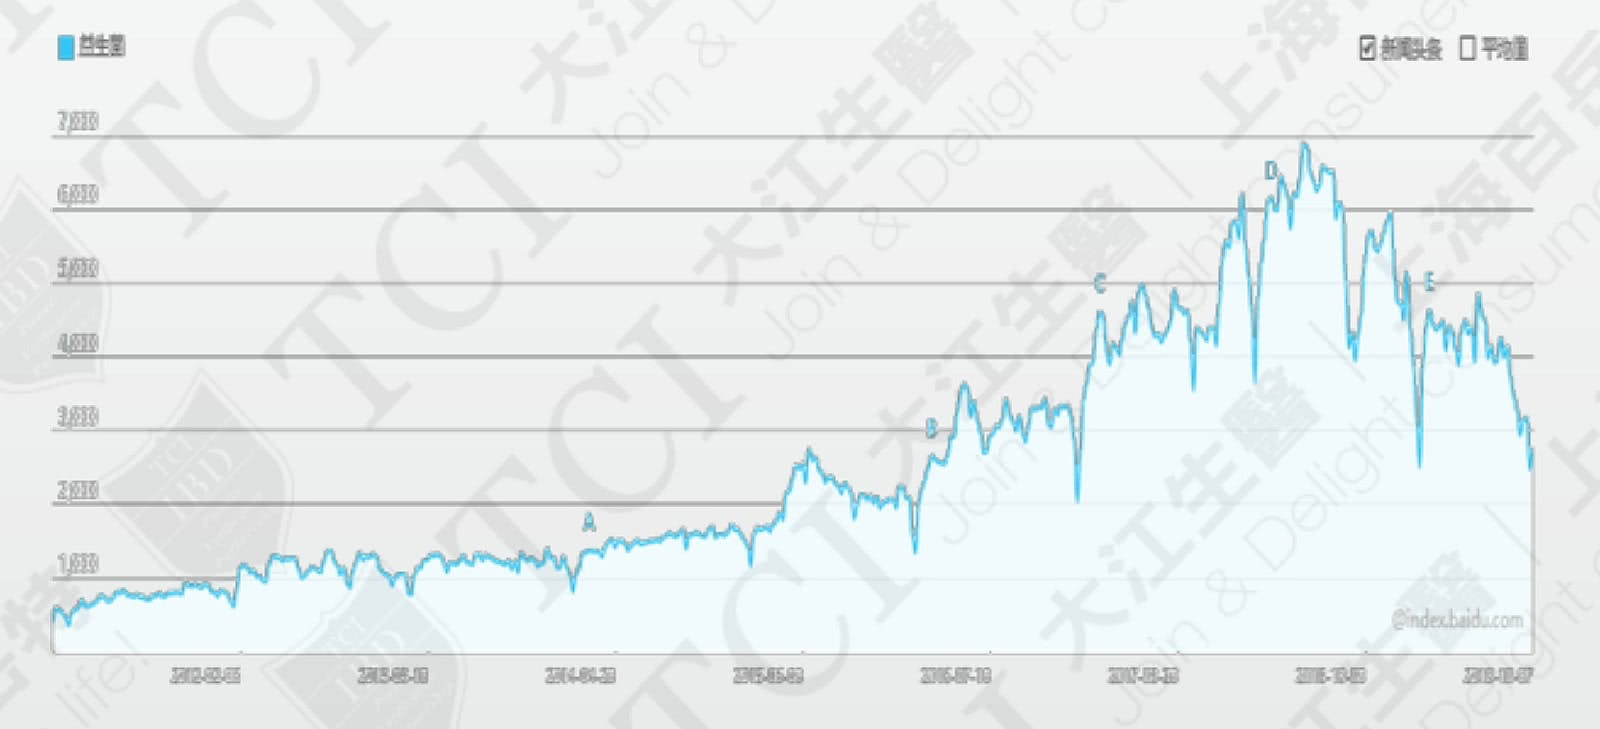 The Search Volume for Probiotics, Data Source: Baidu Index